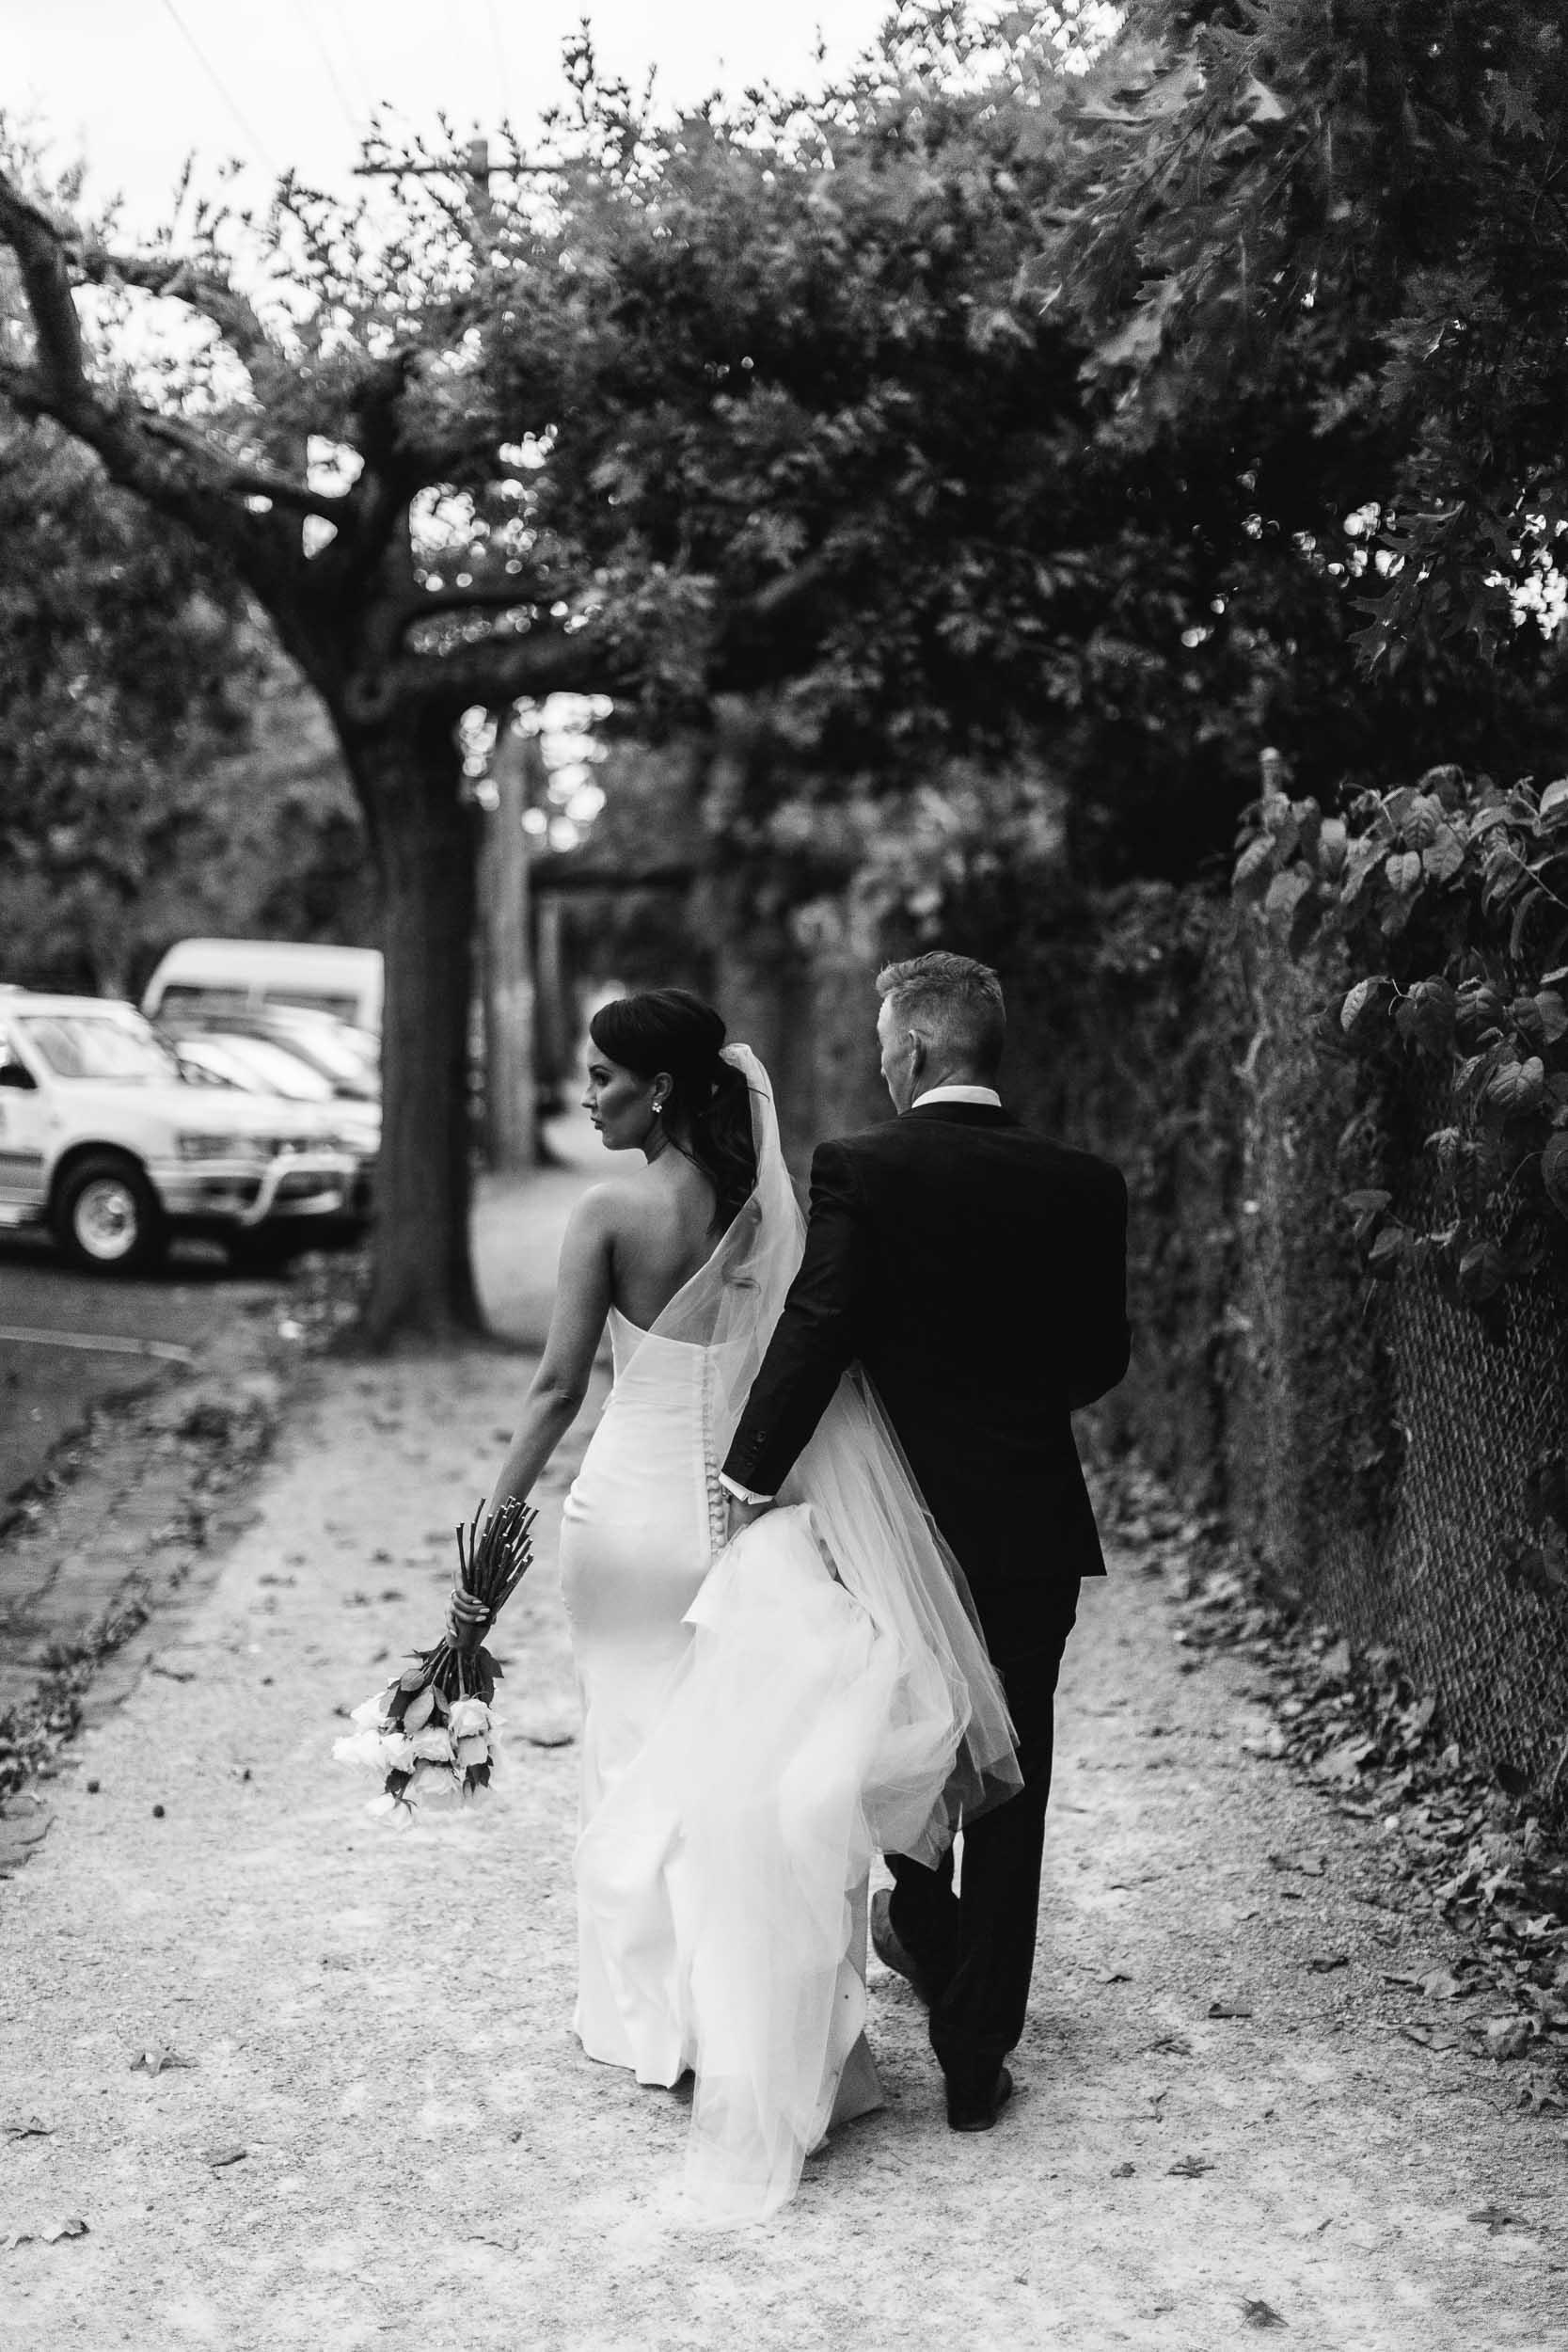 Kas-Richards-Melbourne-Garden-Wedding-Aerial-South-Whark-Georgia-Young-Couture-342.jpg